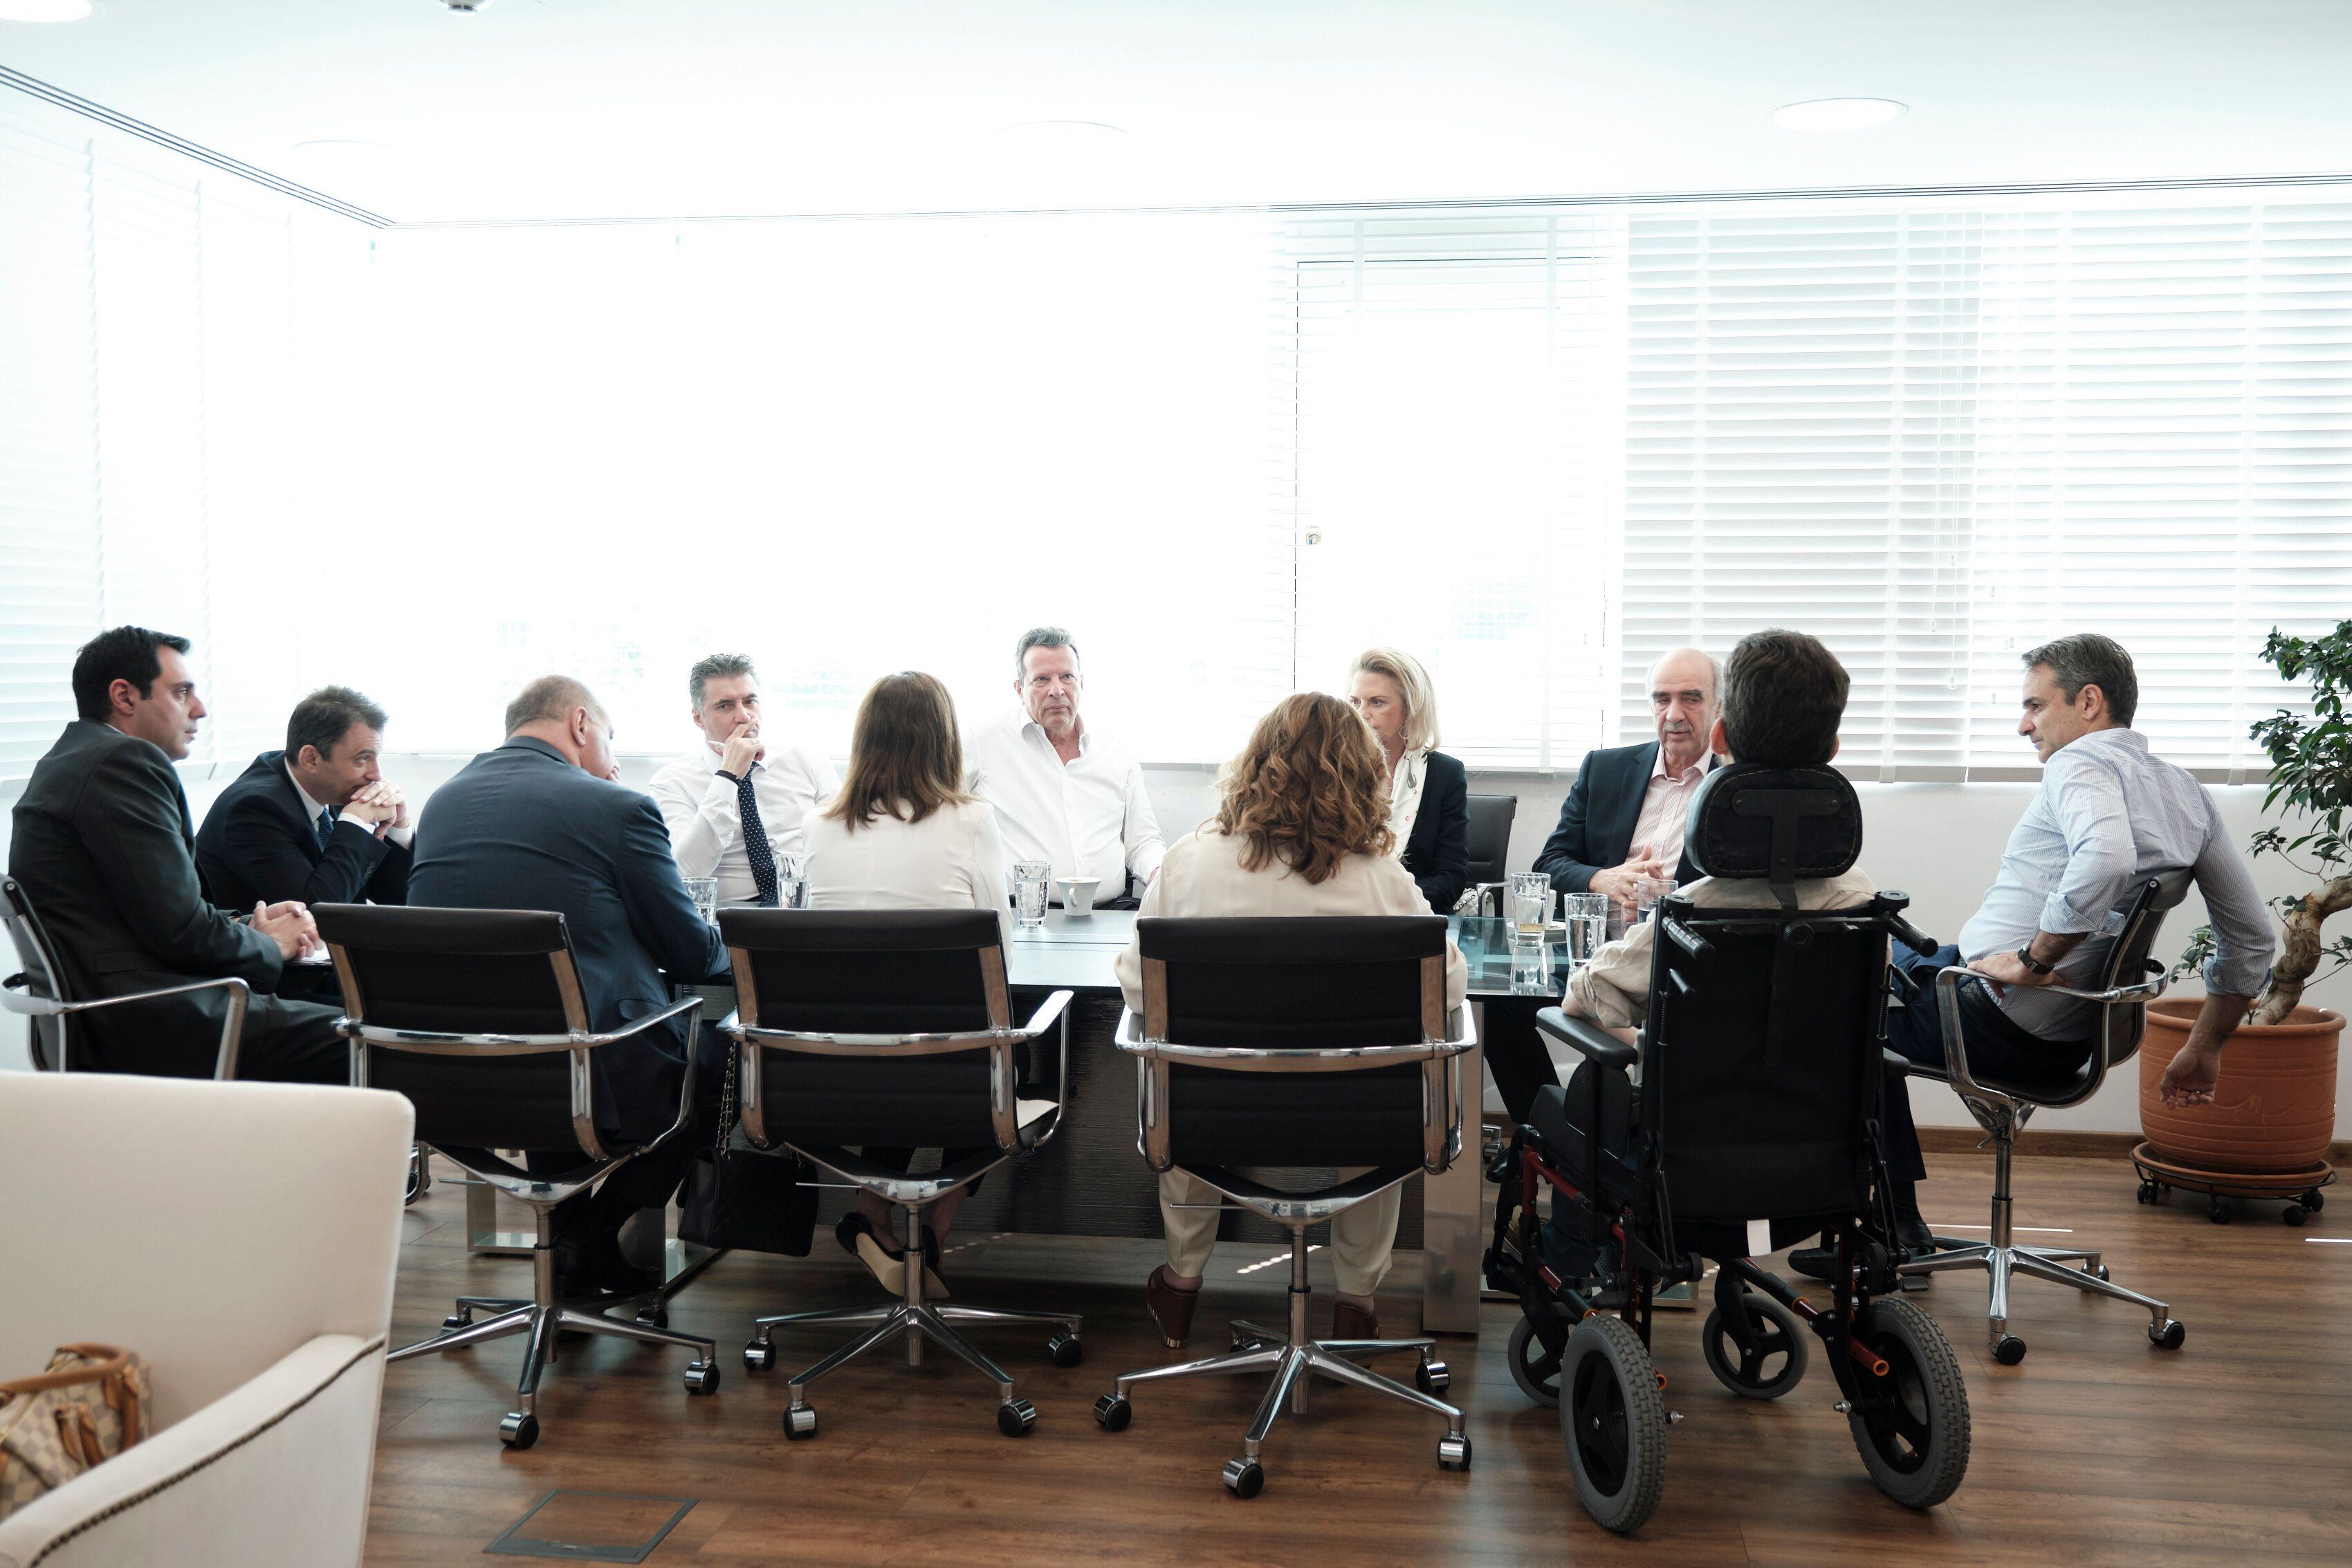 Oι 8 Ευρωβουλευτές της ΝΔ με τον Κυριάκο Μητσοτάκη